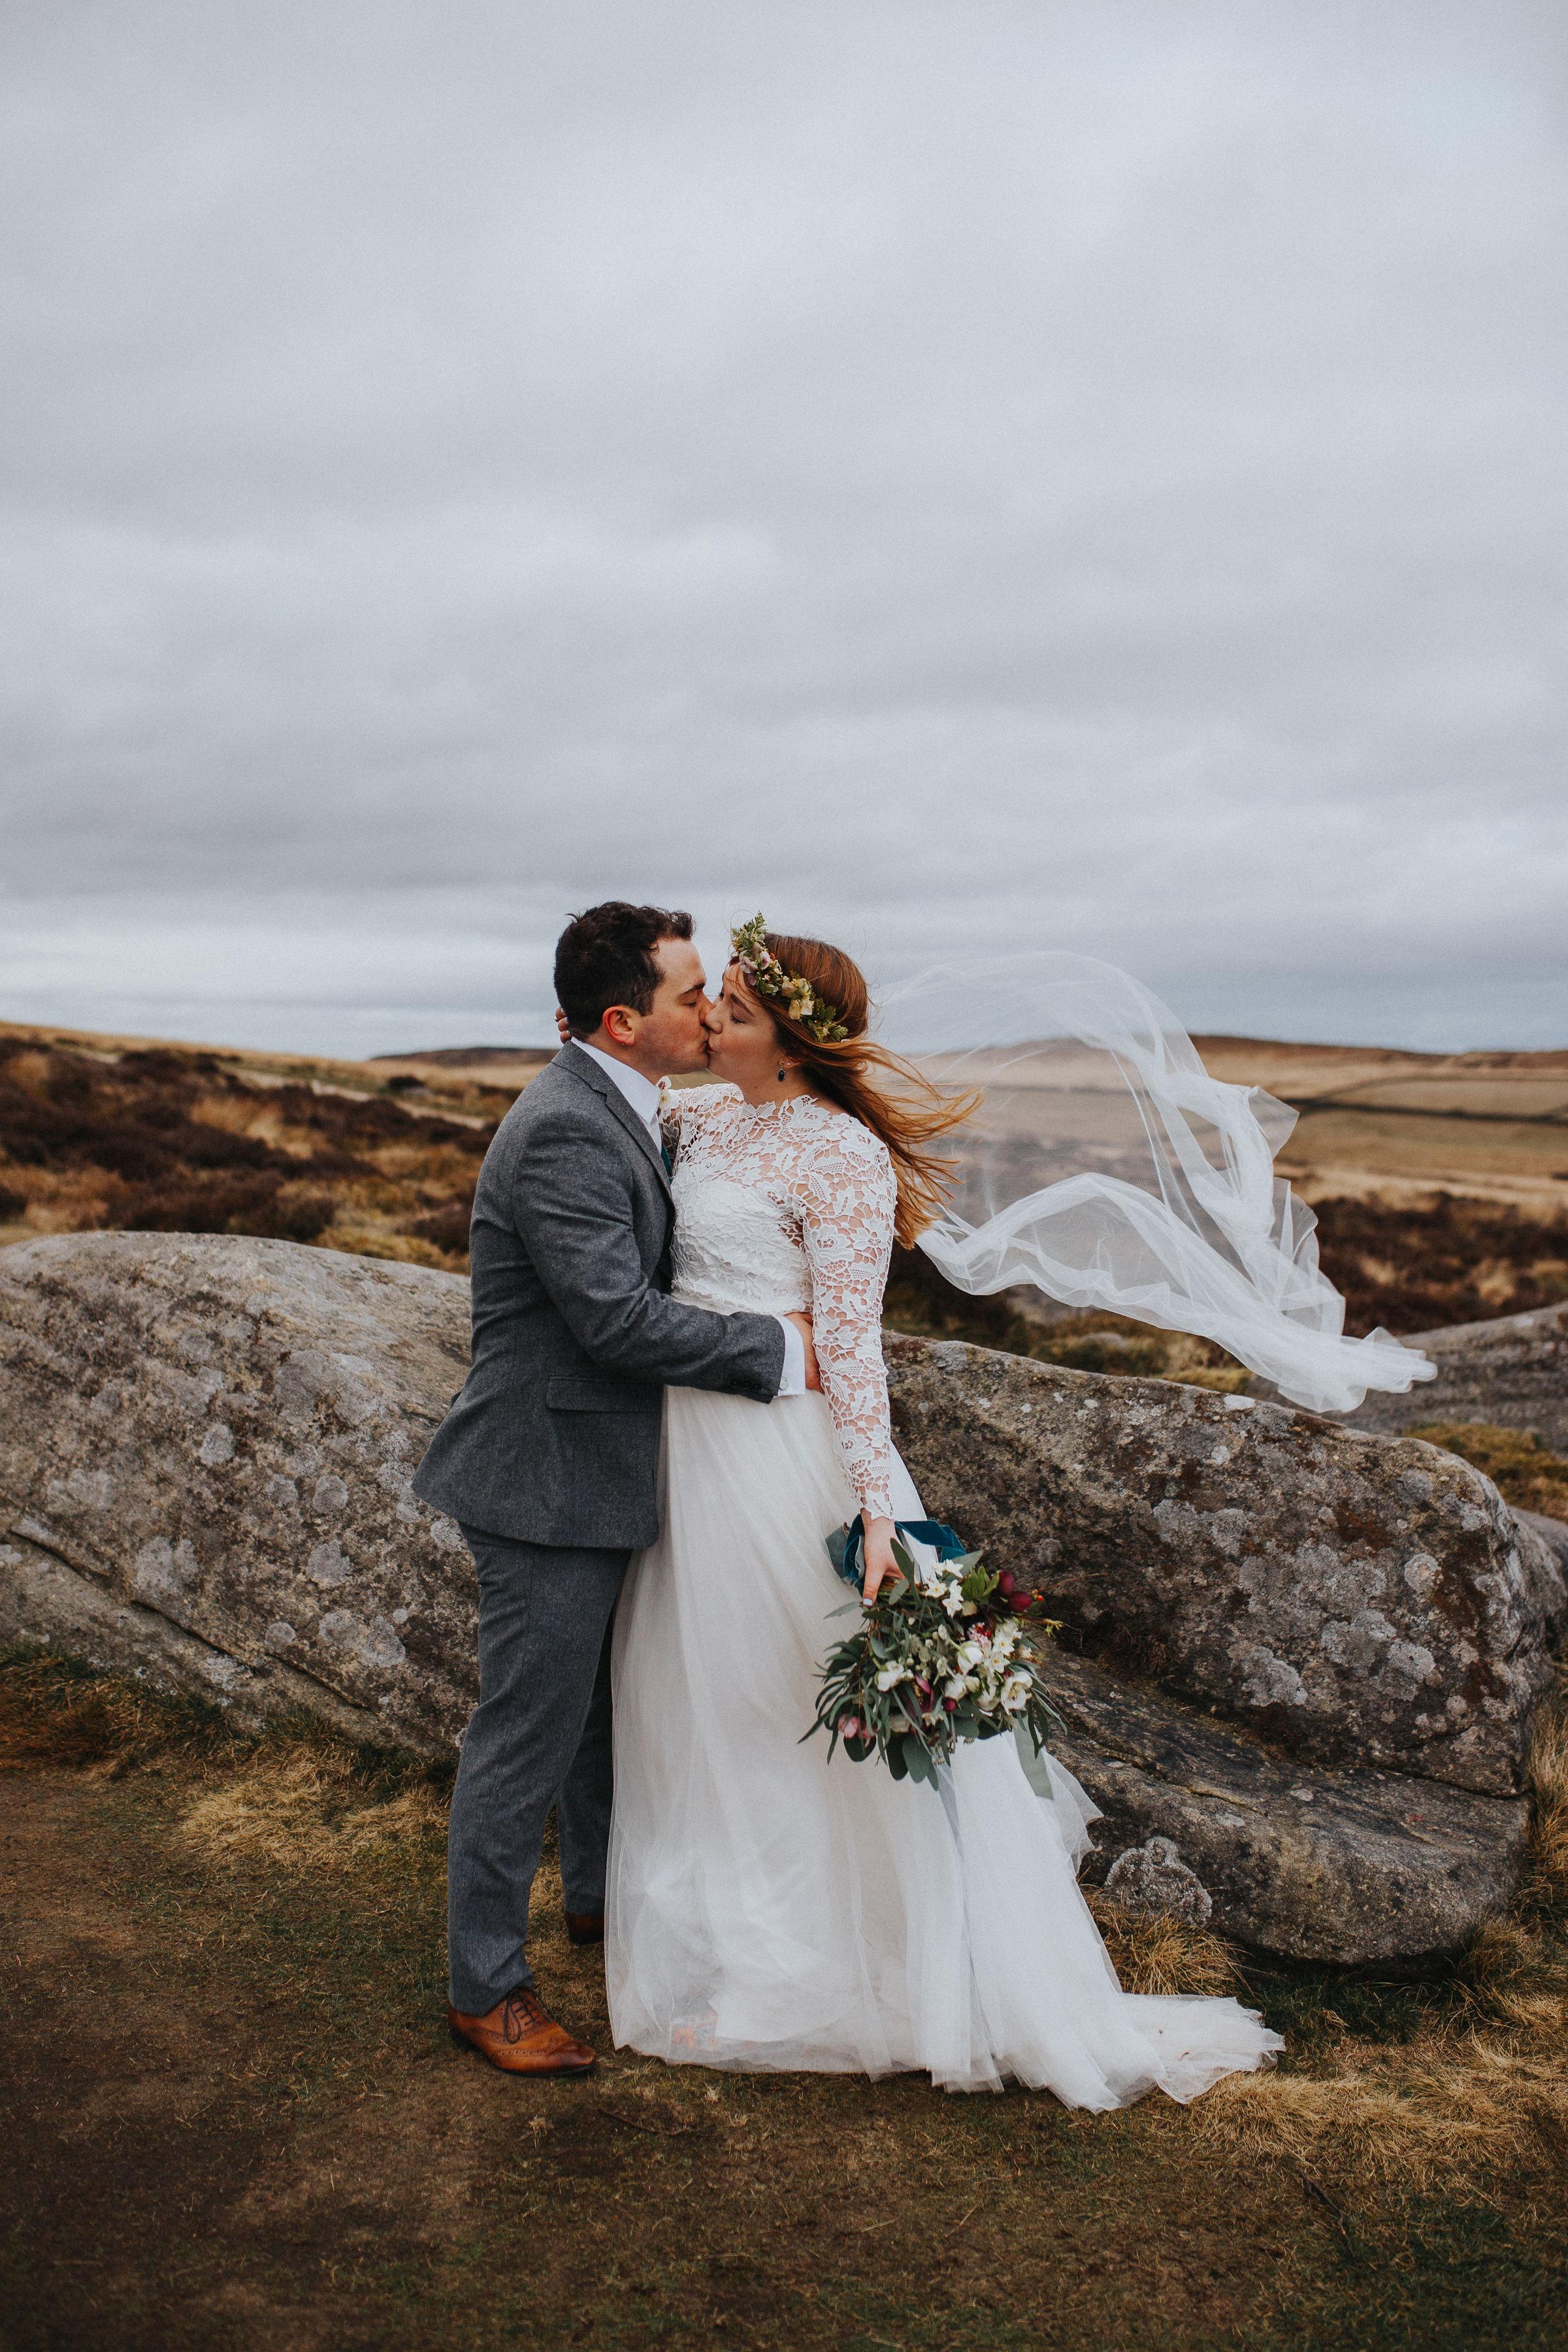 Rosie-bespoke-lace-long sleeved-tulle-wedding-dress-winter-peak district-susanna greening-24.jpg